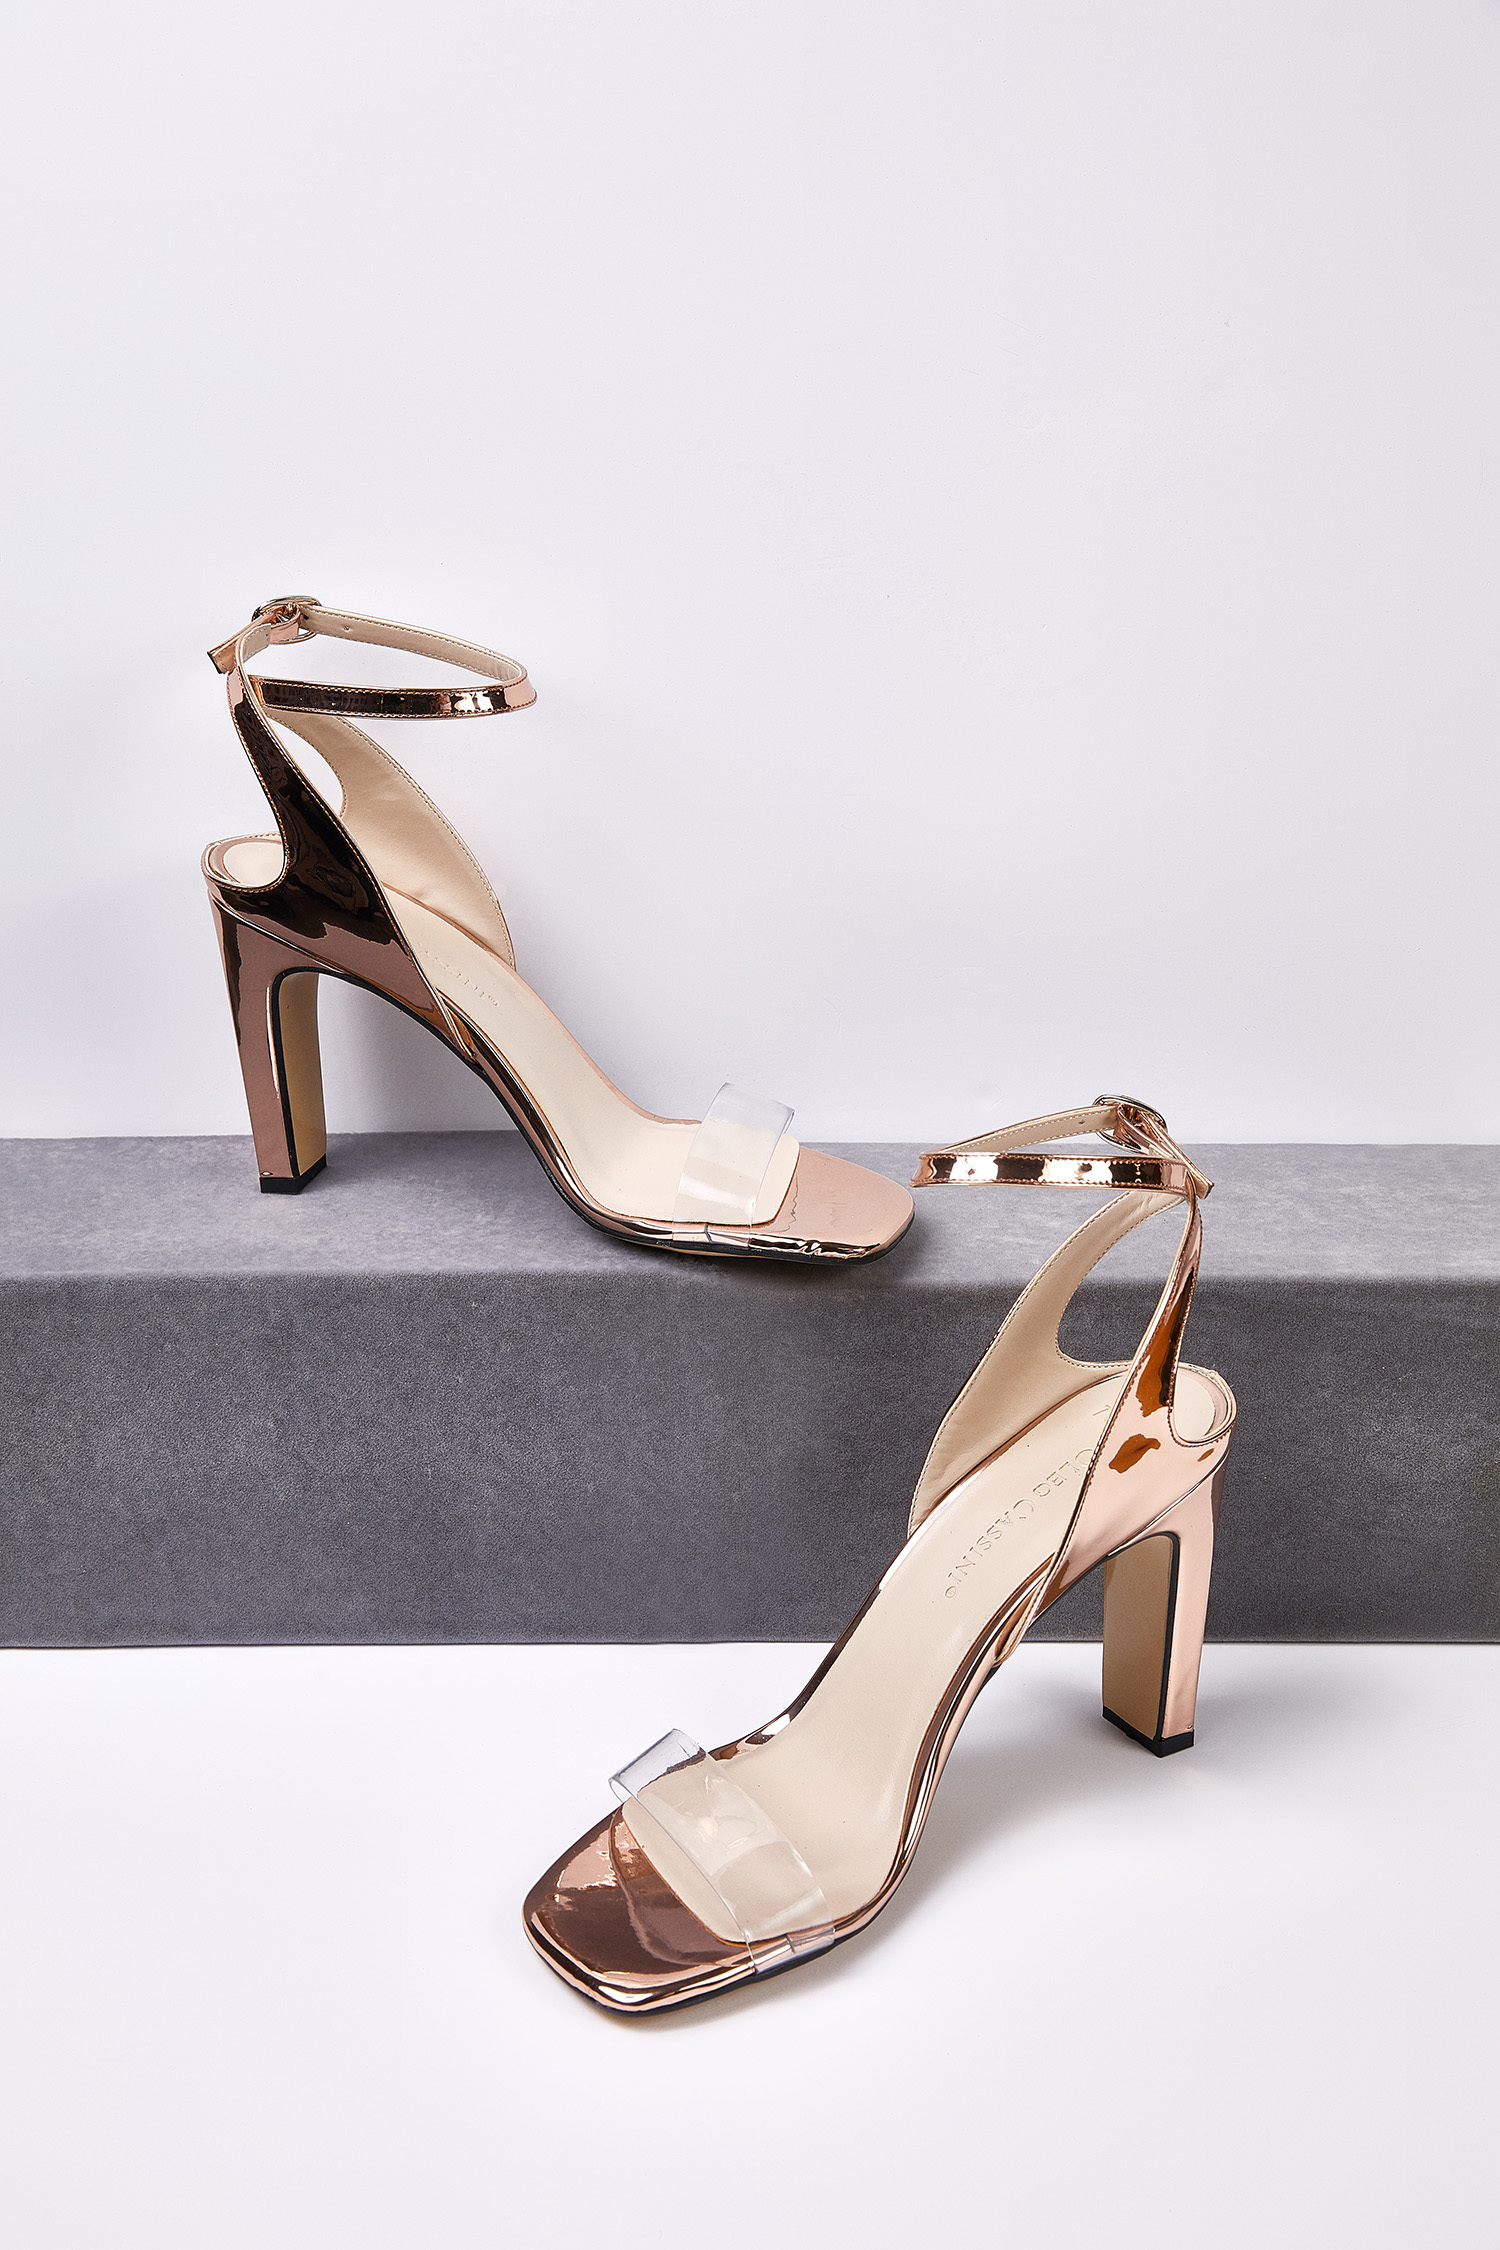 Rose Gold Şeffaf Bantlı Dolgu Topuklu Abiye Ayakkabısı - Thumbnail